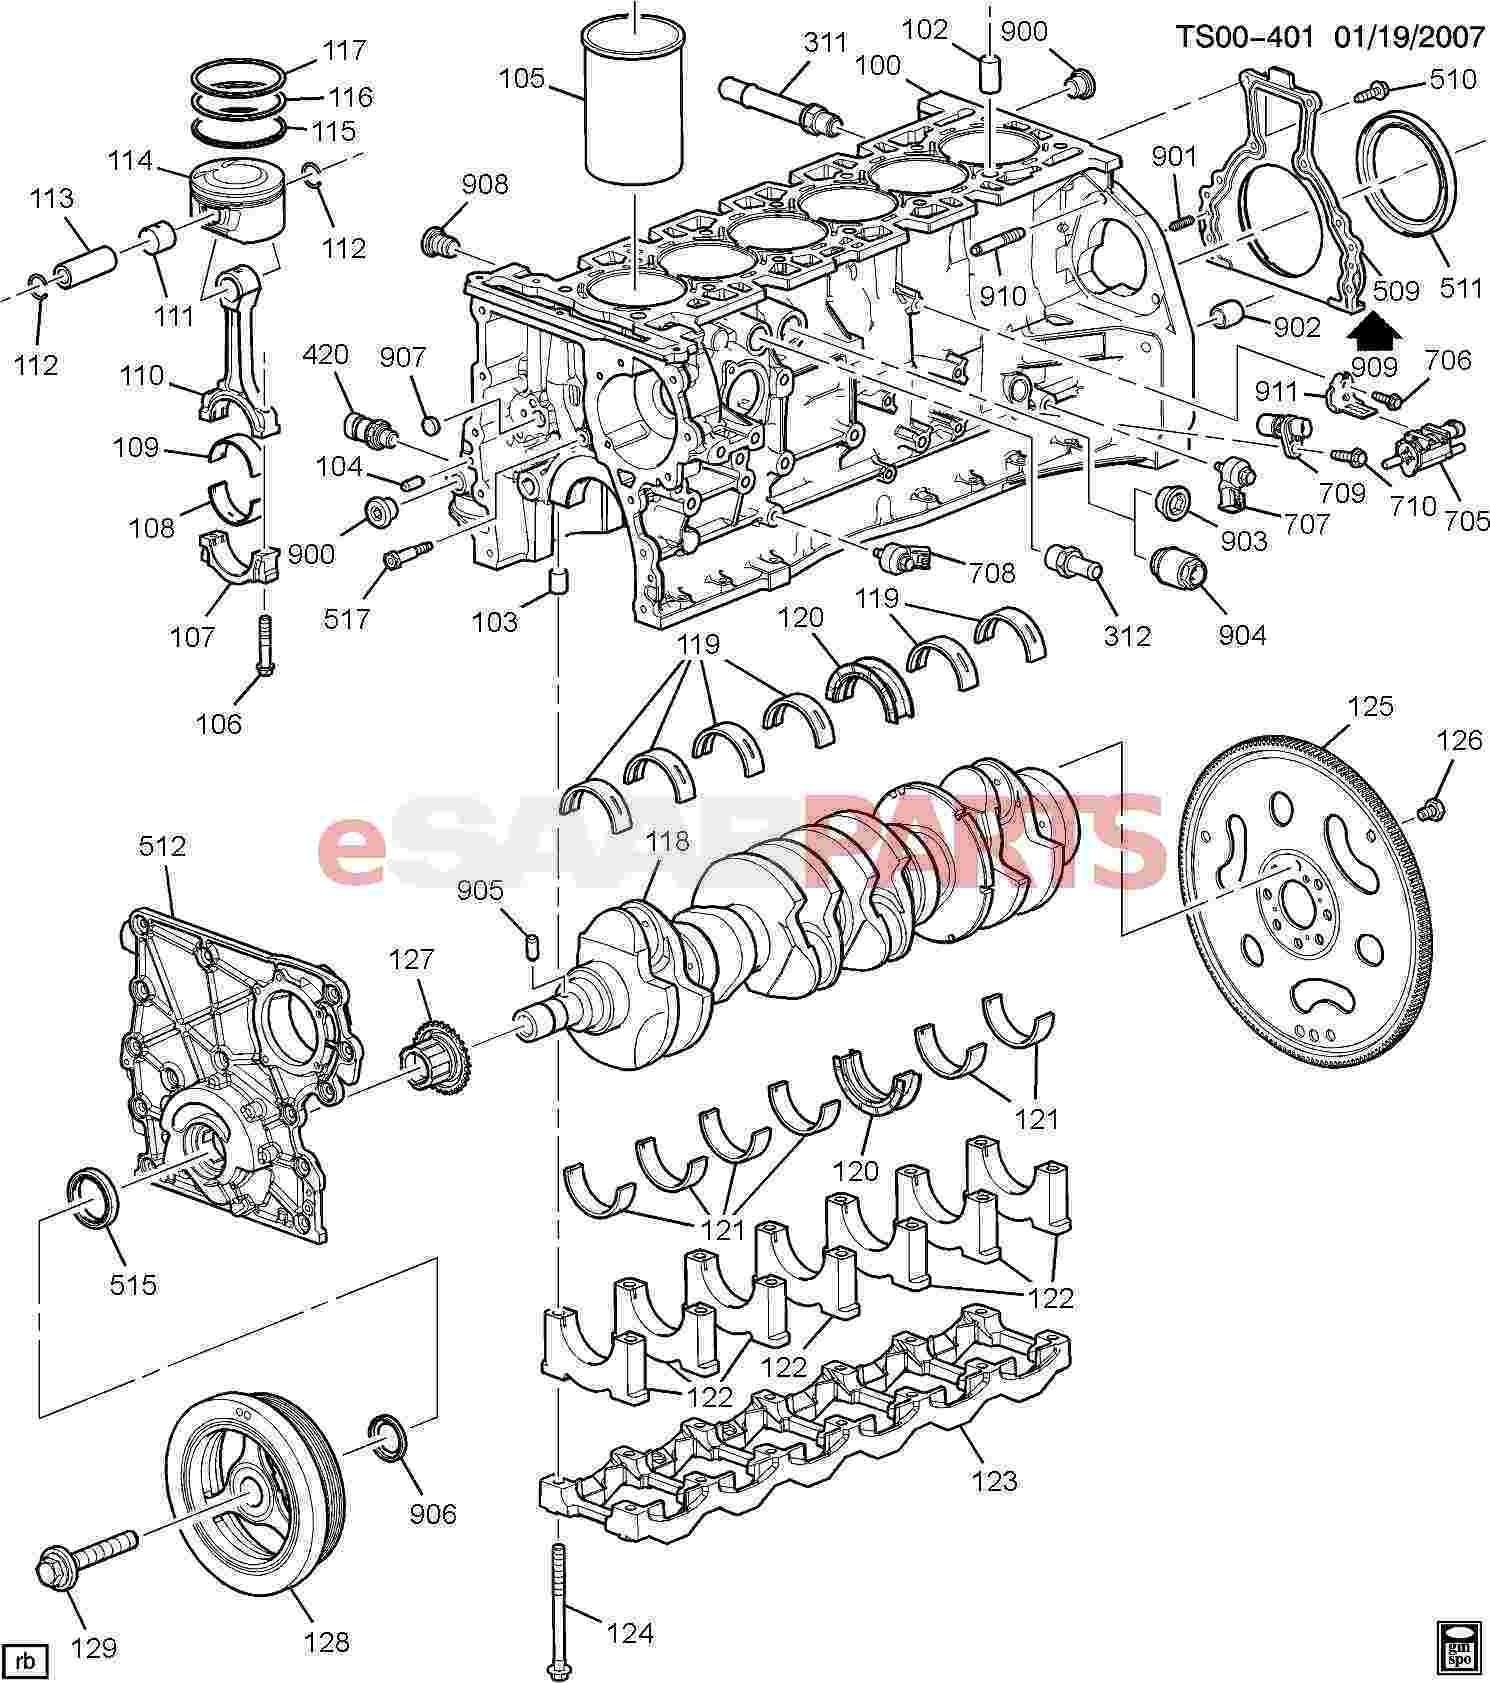 1999 Gmc Yukon Engine Diagram Esaabparts Saab 9 7x Engine Parts Engine Internal 4 2s Of 1999 Gmc Yukon Engine Diagram